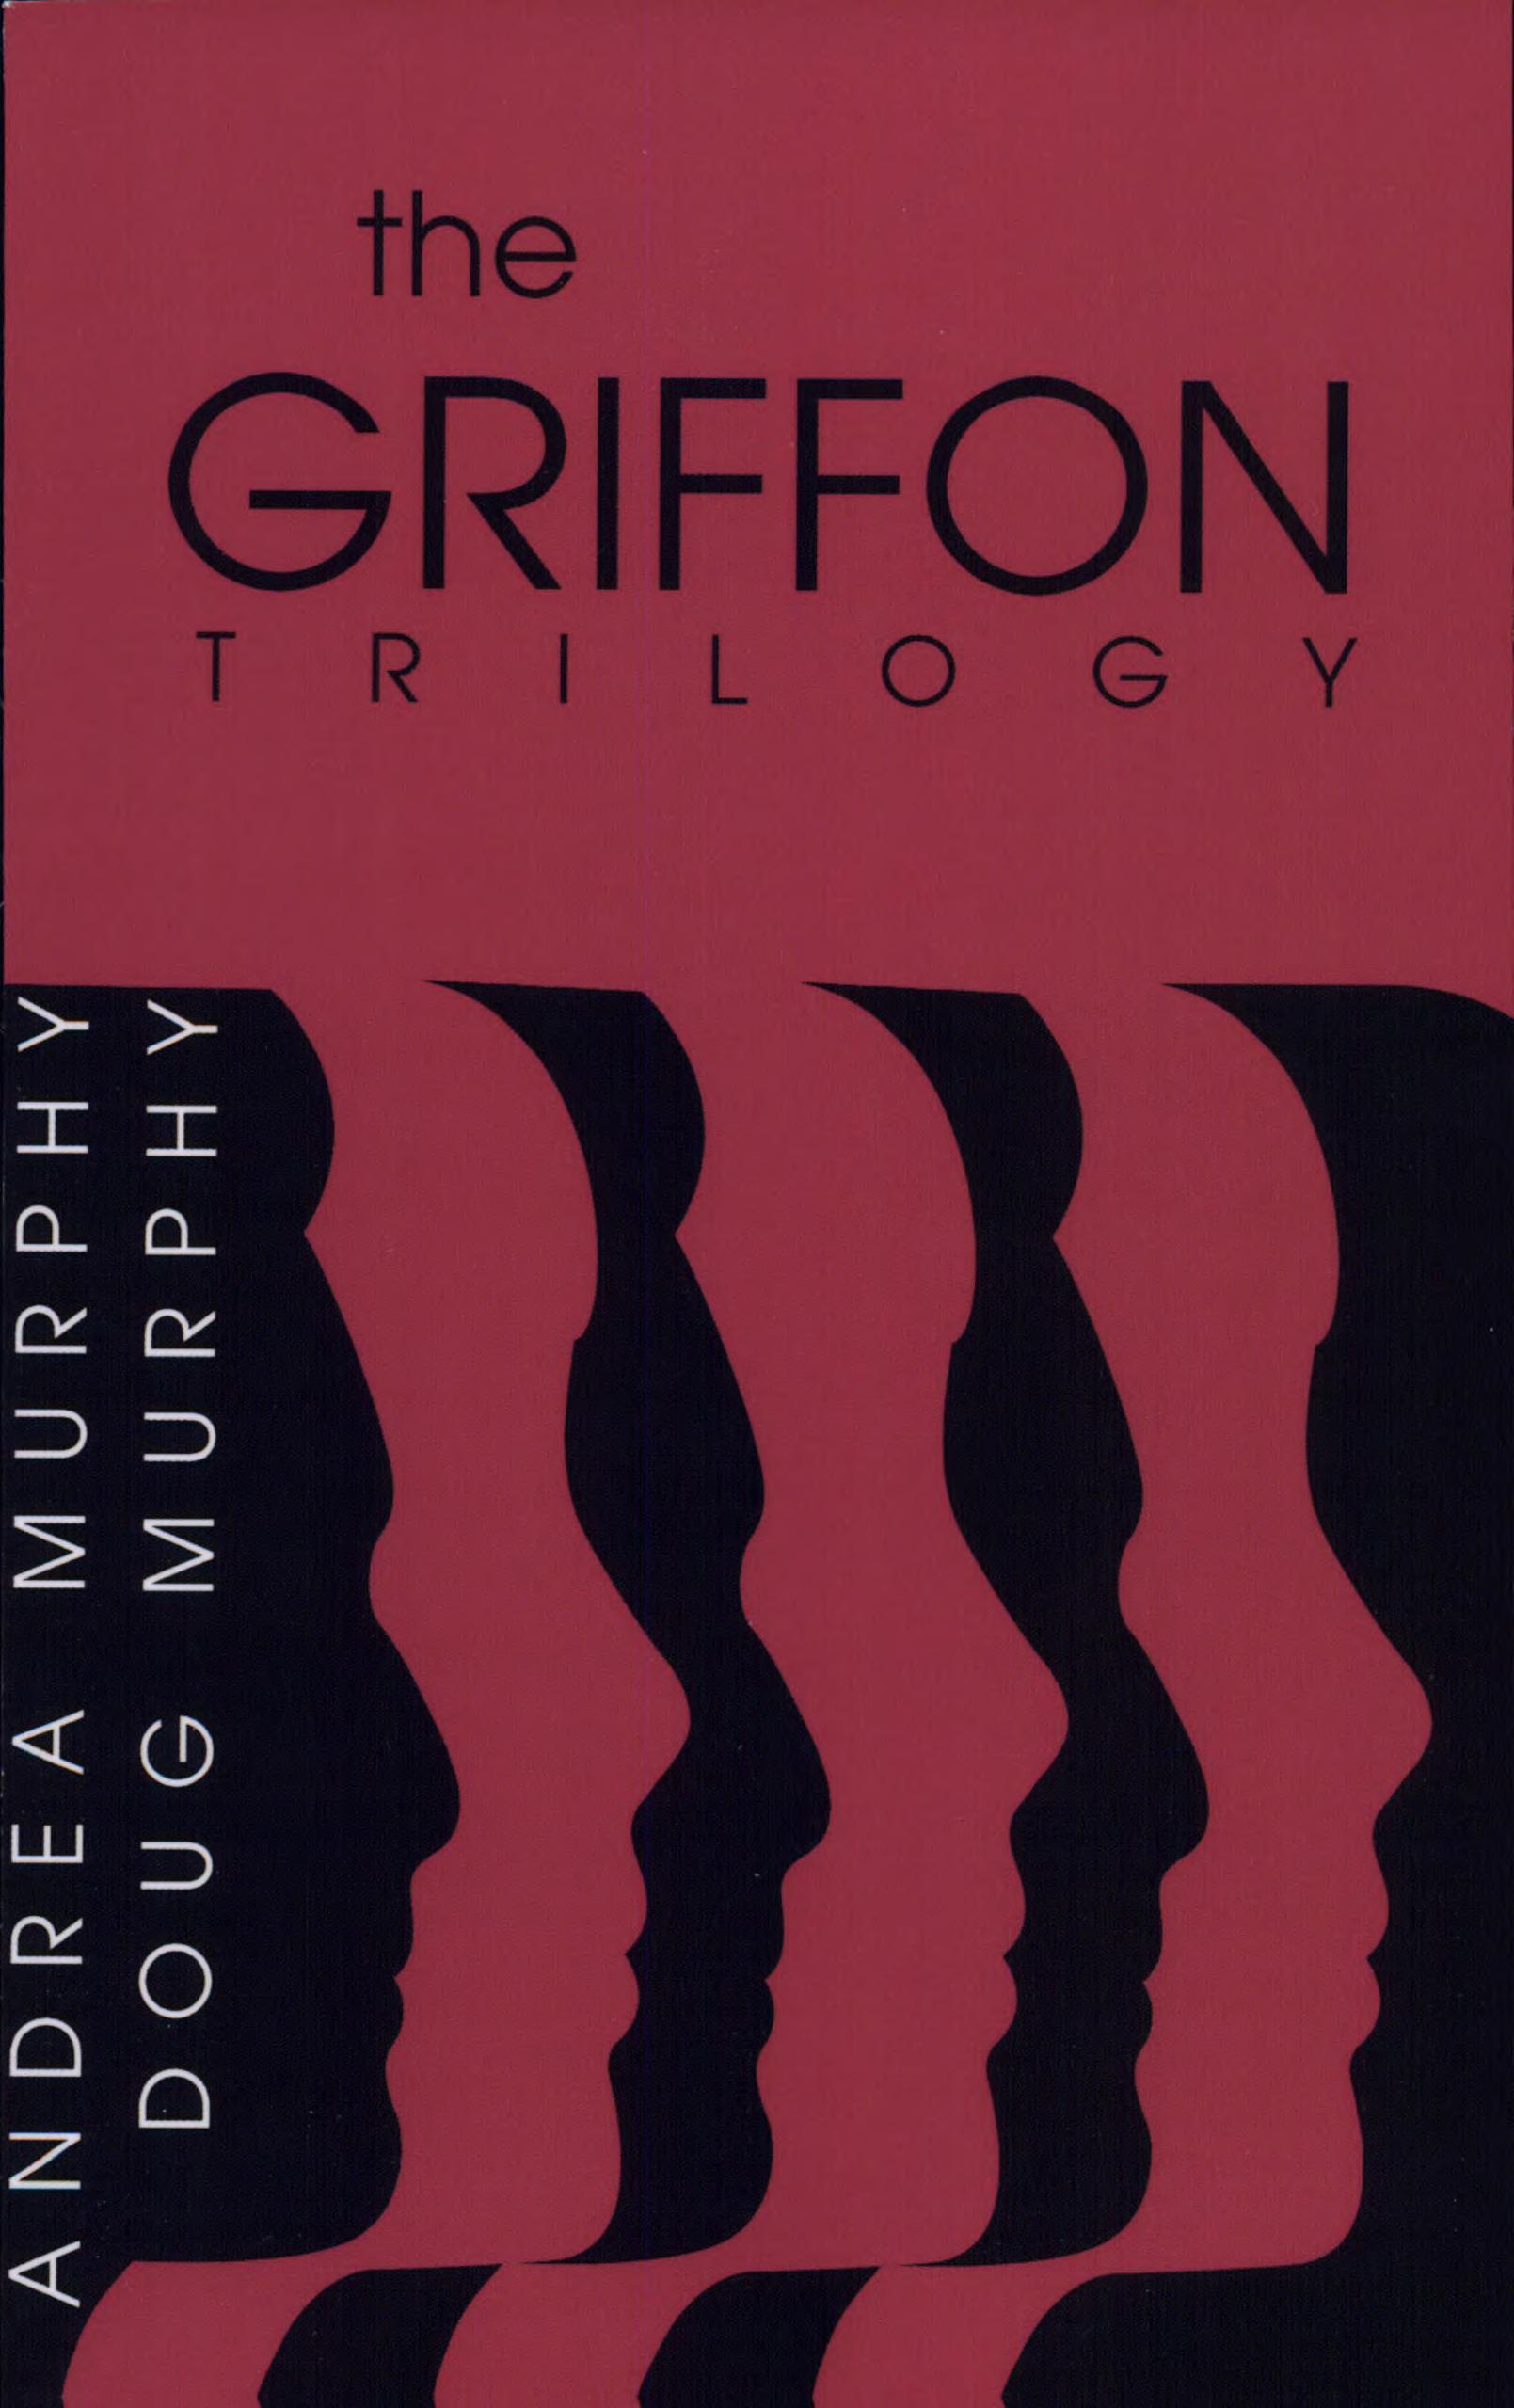 The Griffon Trilogy